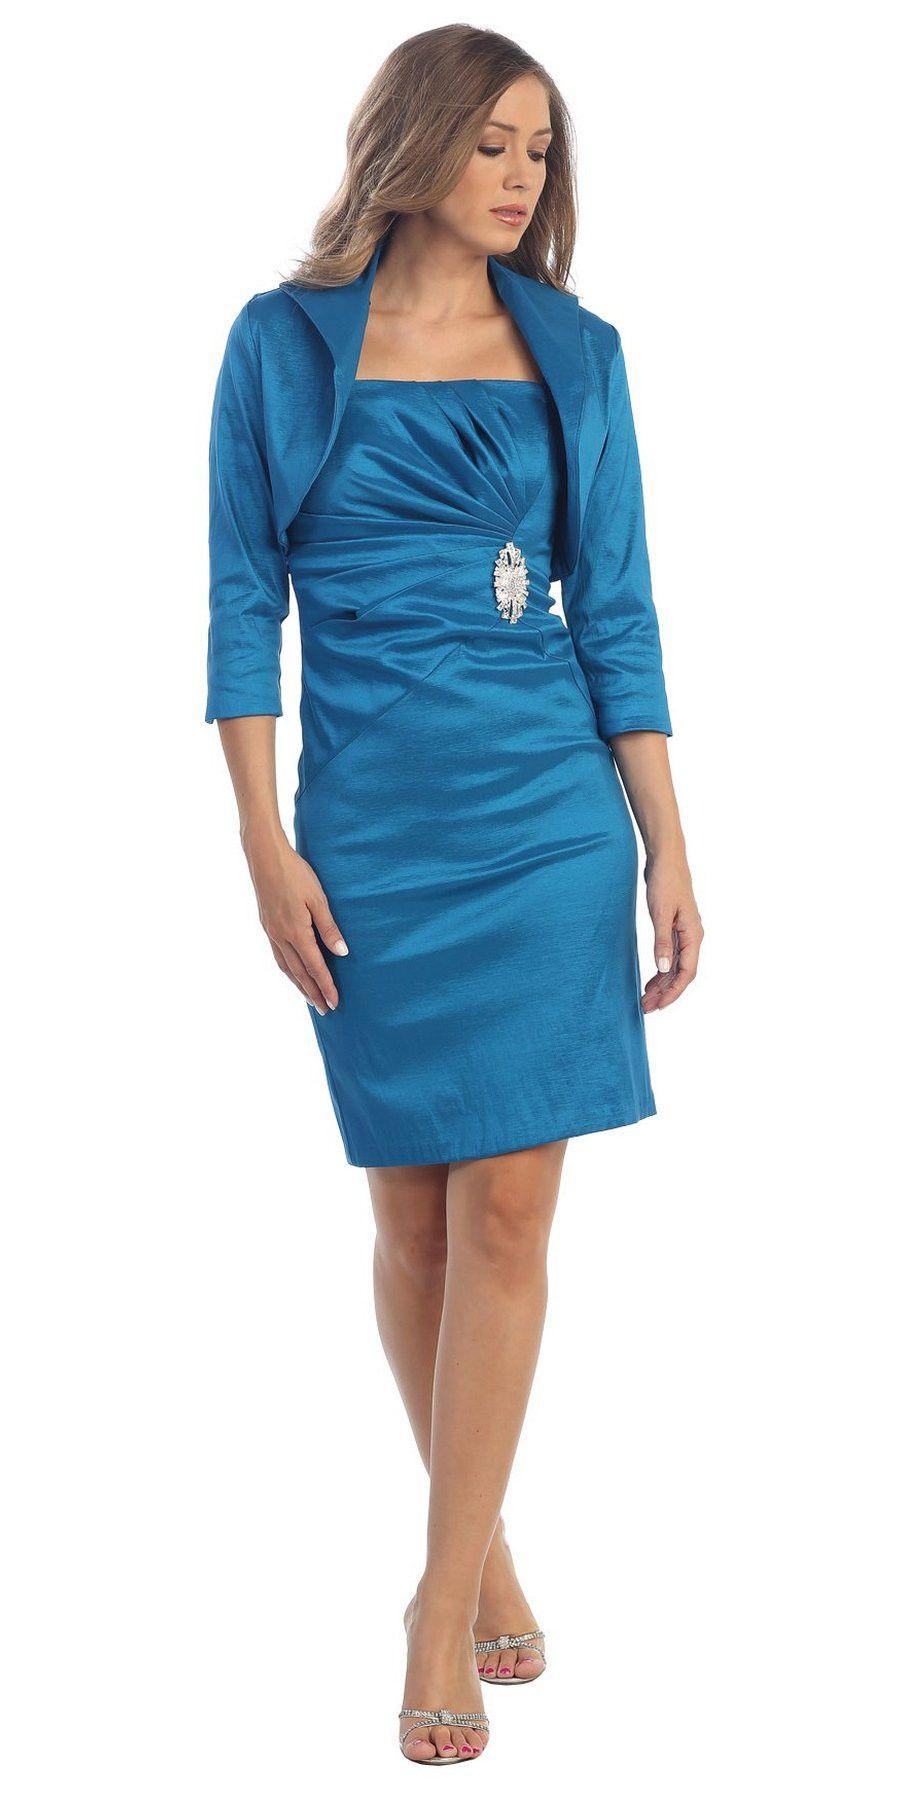 Taffeta Knee Length Red Dress Includes 3/4 Length Bolero Jacket ...